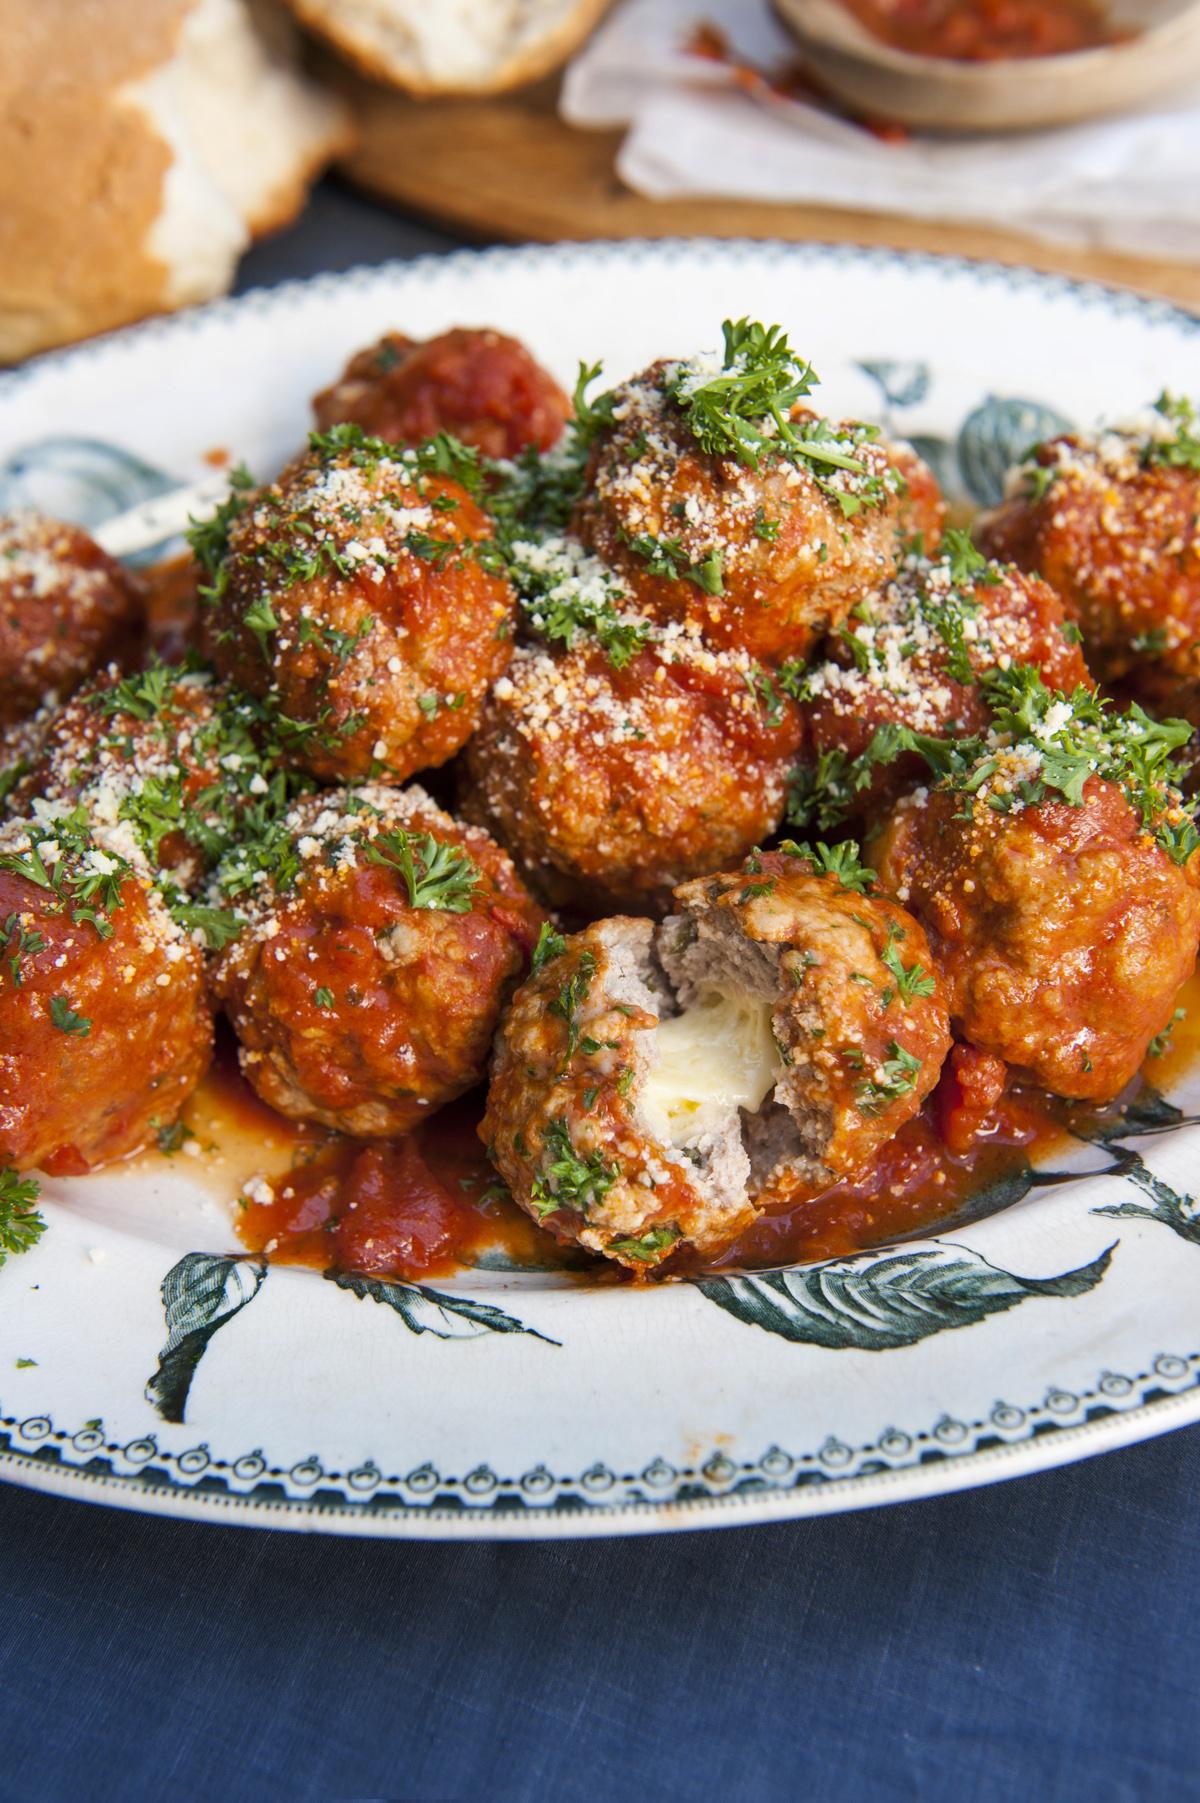 Bocconcini Meatballs